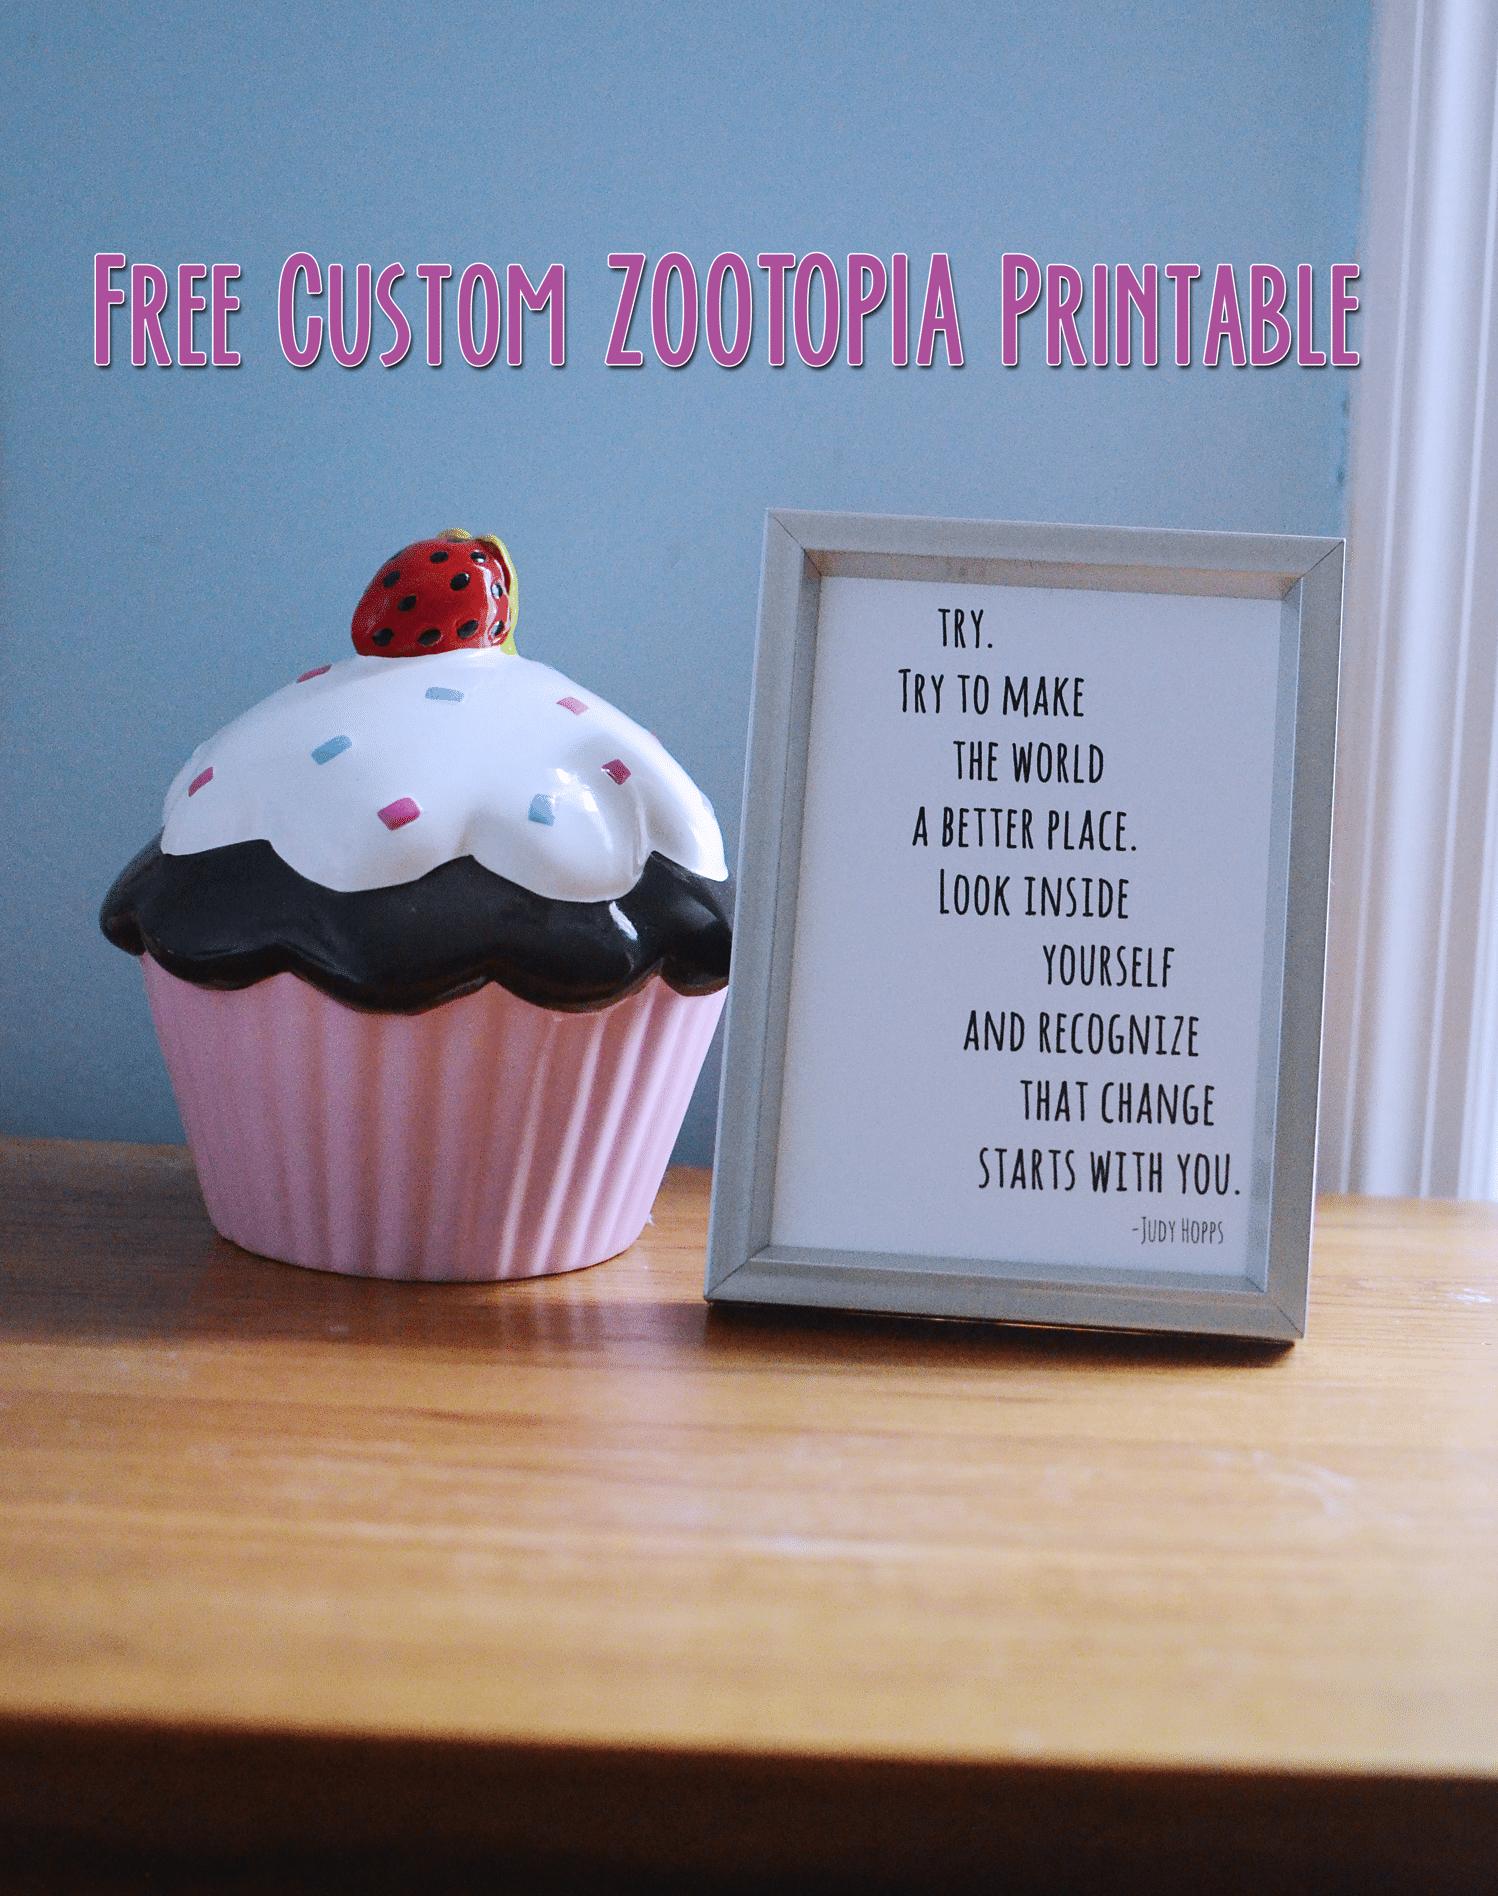 free custom judy hopps zootopia quote